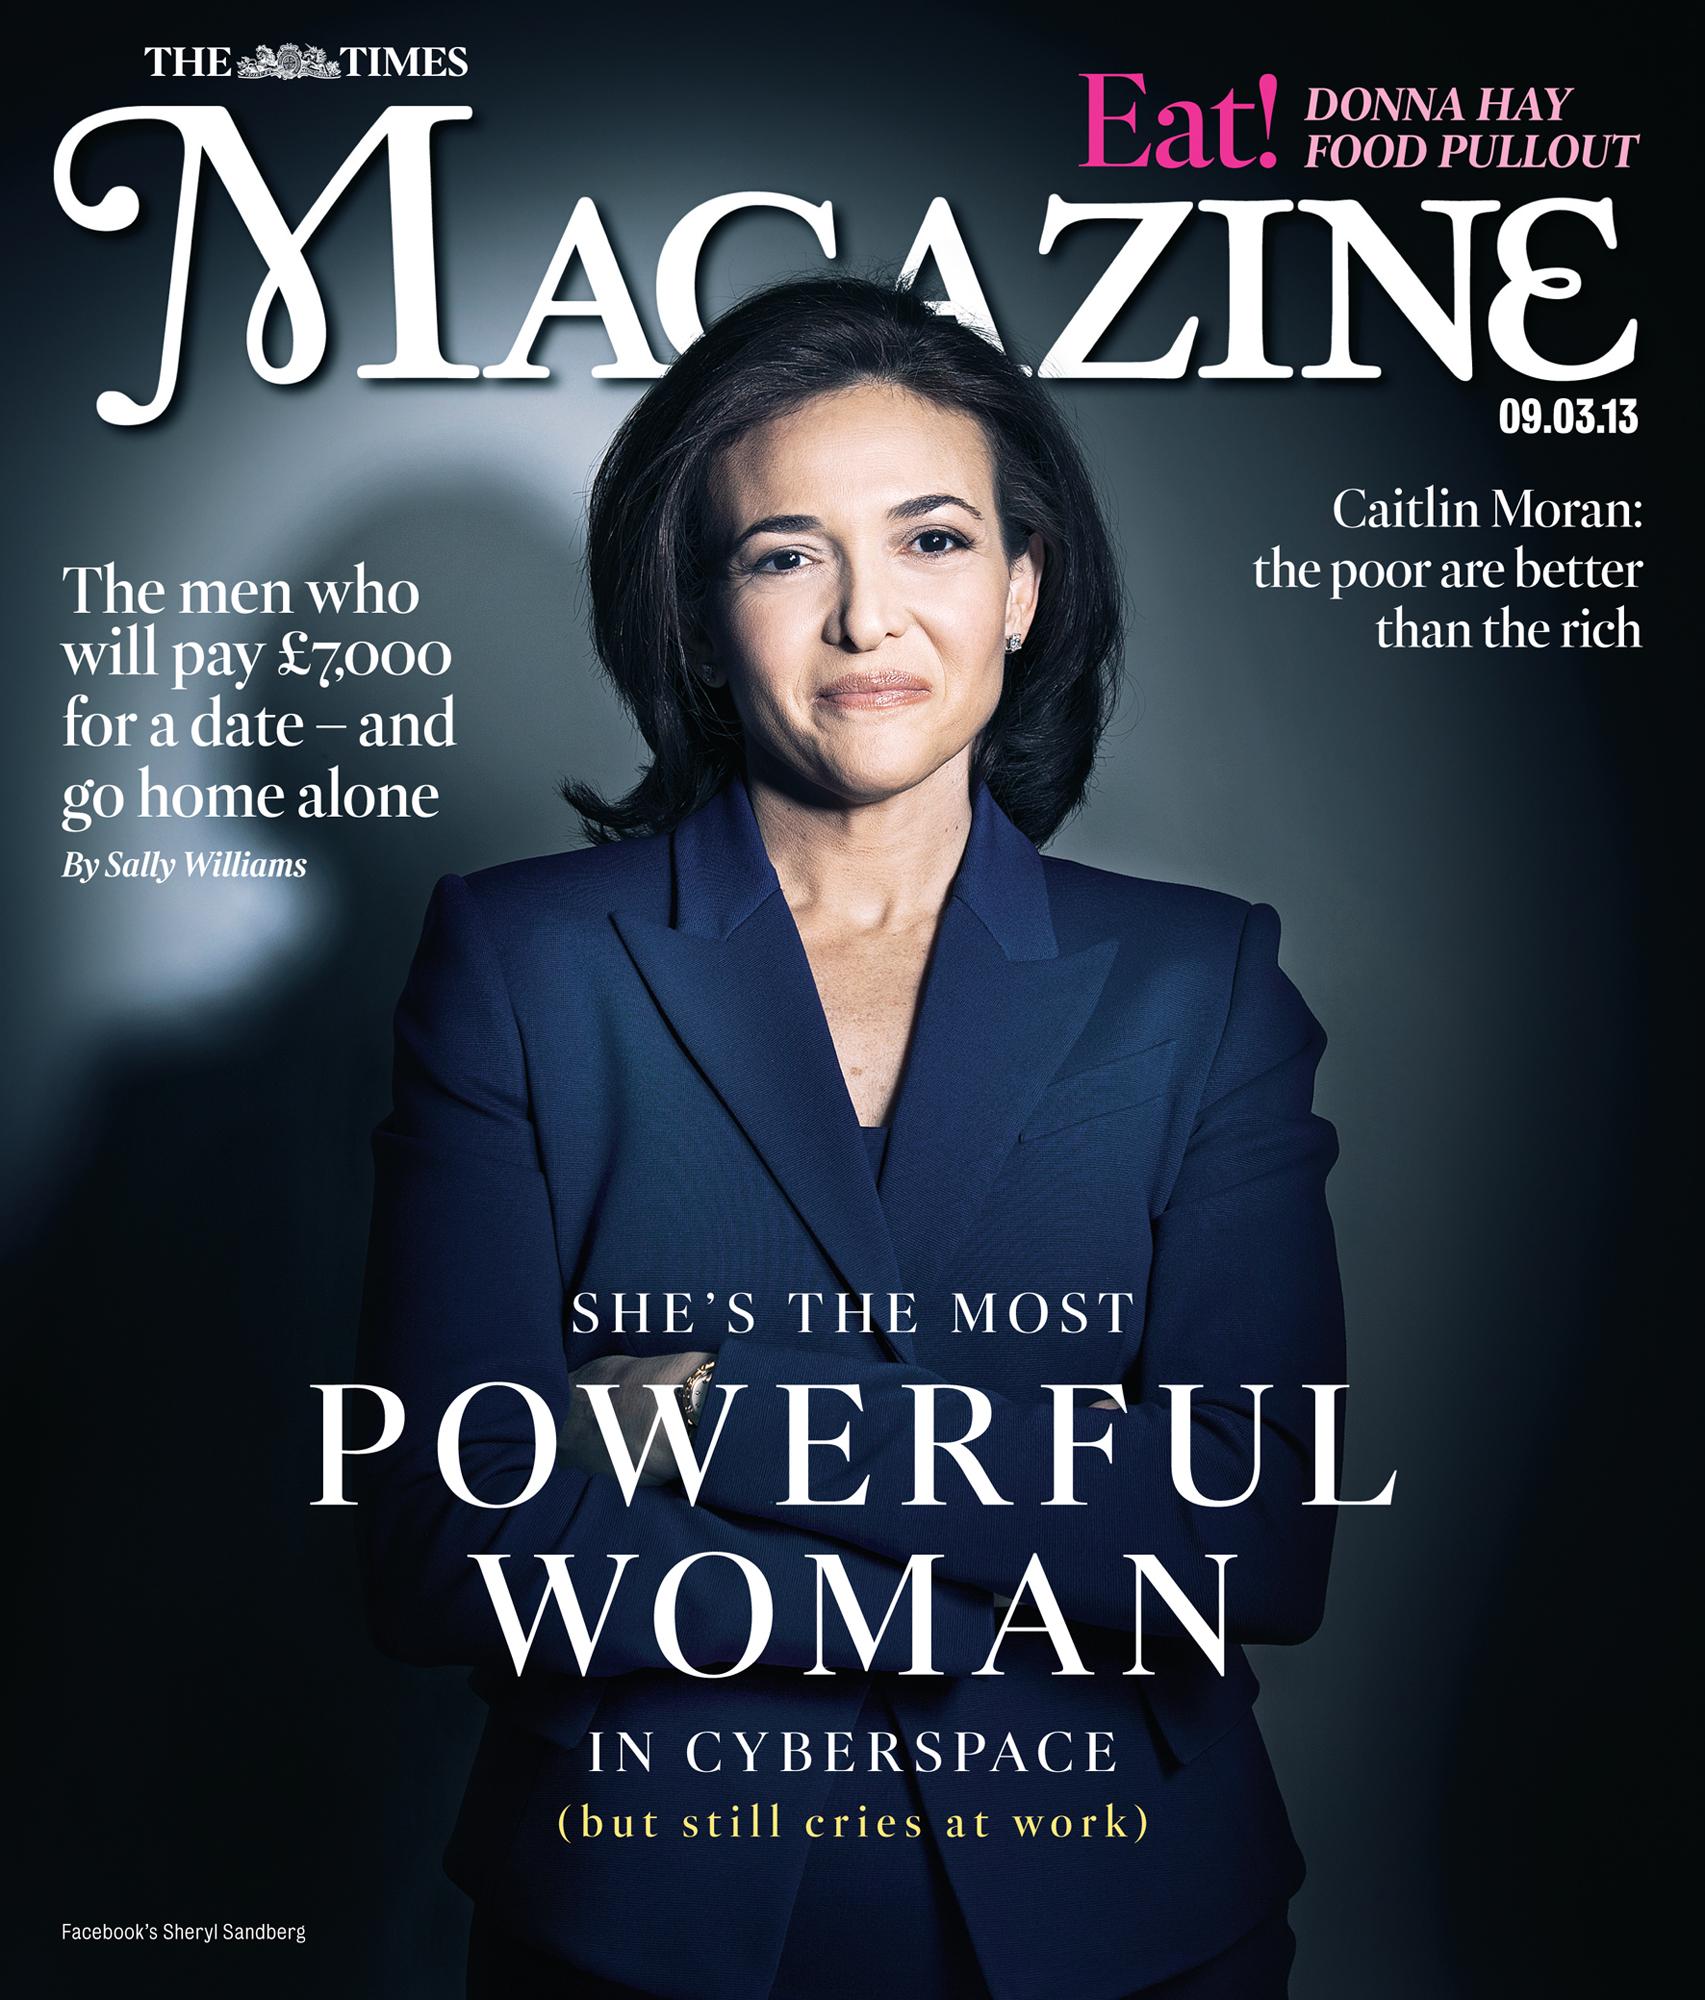 business women, facebook coo, Lean in founder sheryl sandberg biography